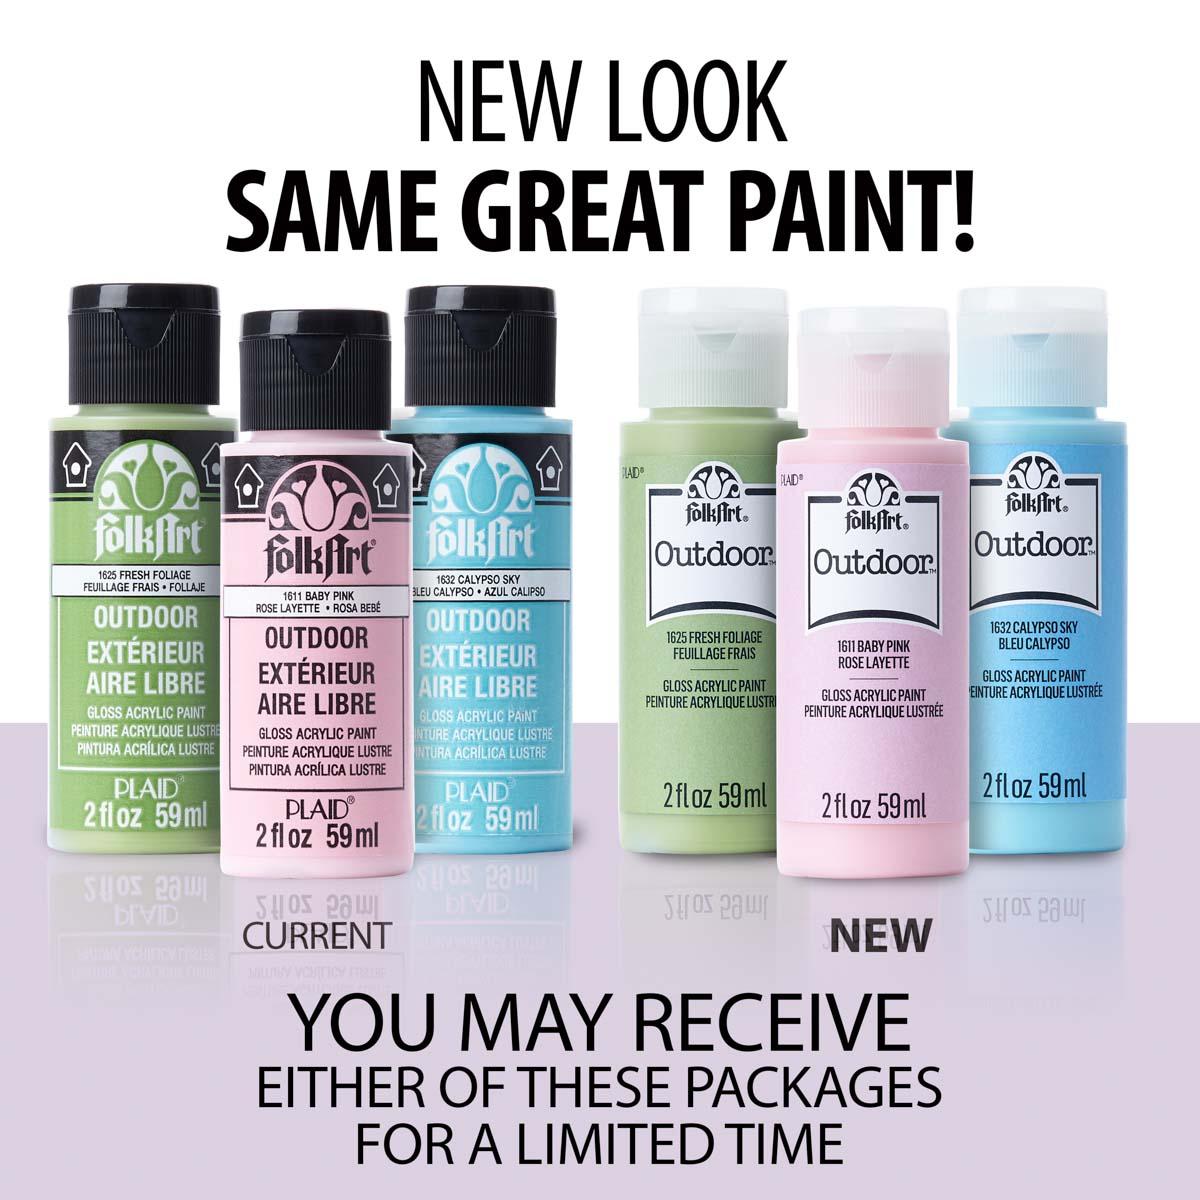 FolkArt ® Outdoor™ Acrylic Paint 12 Color Set - PROMOFAOD